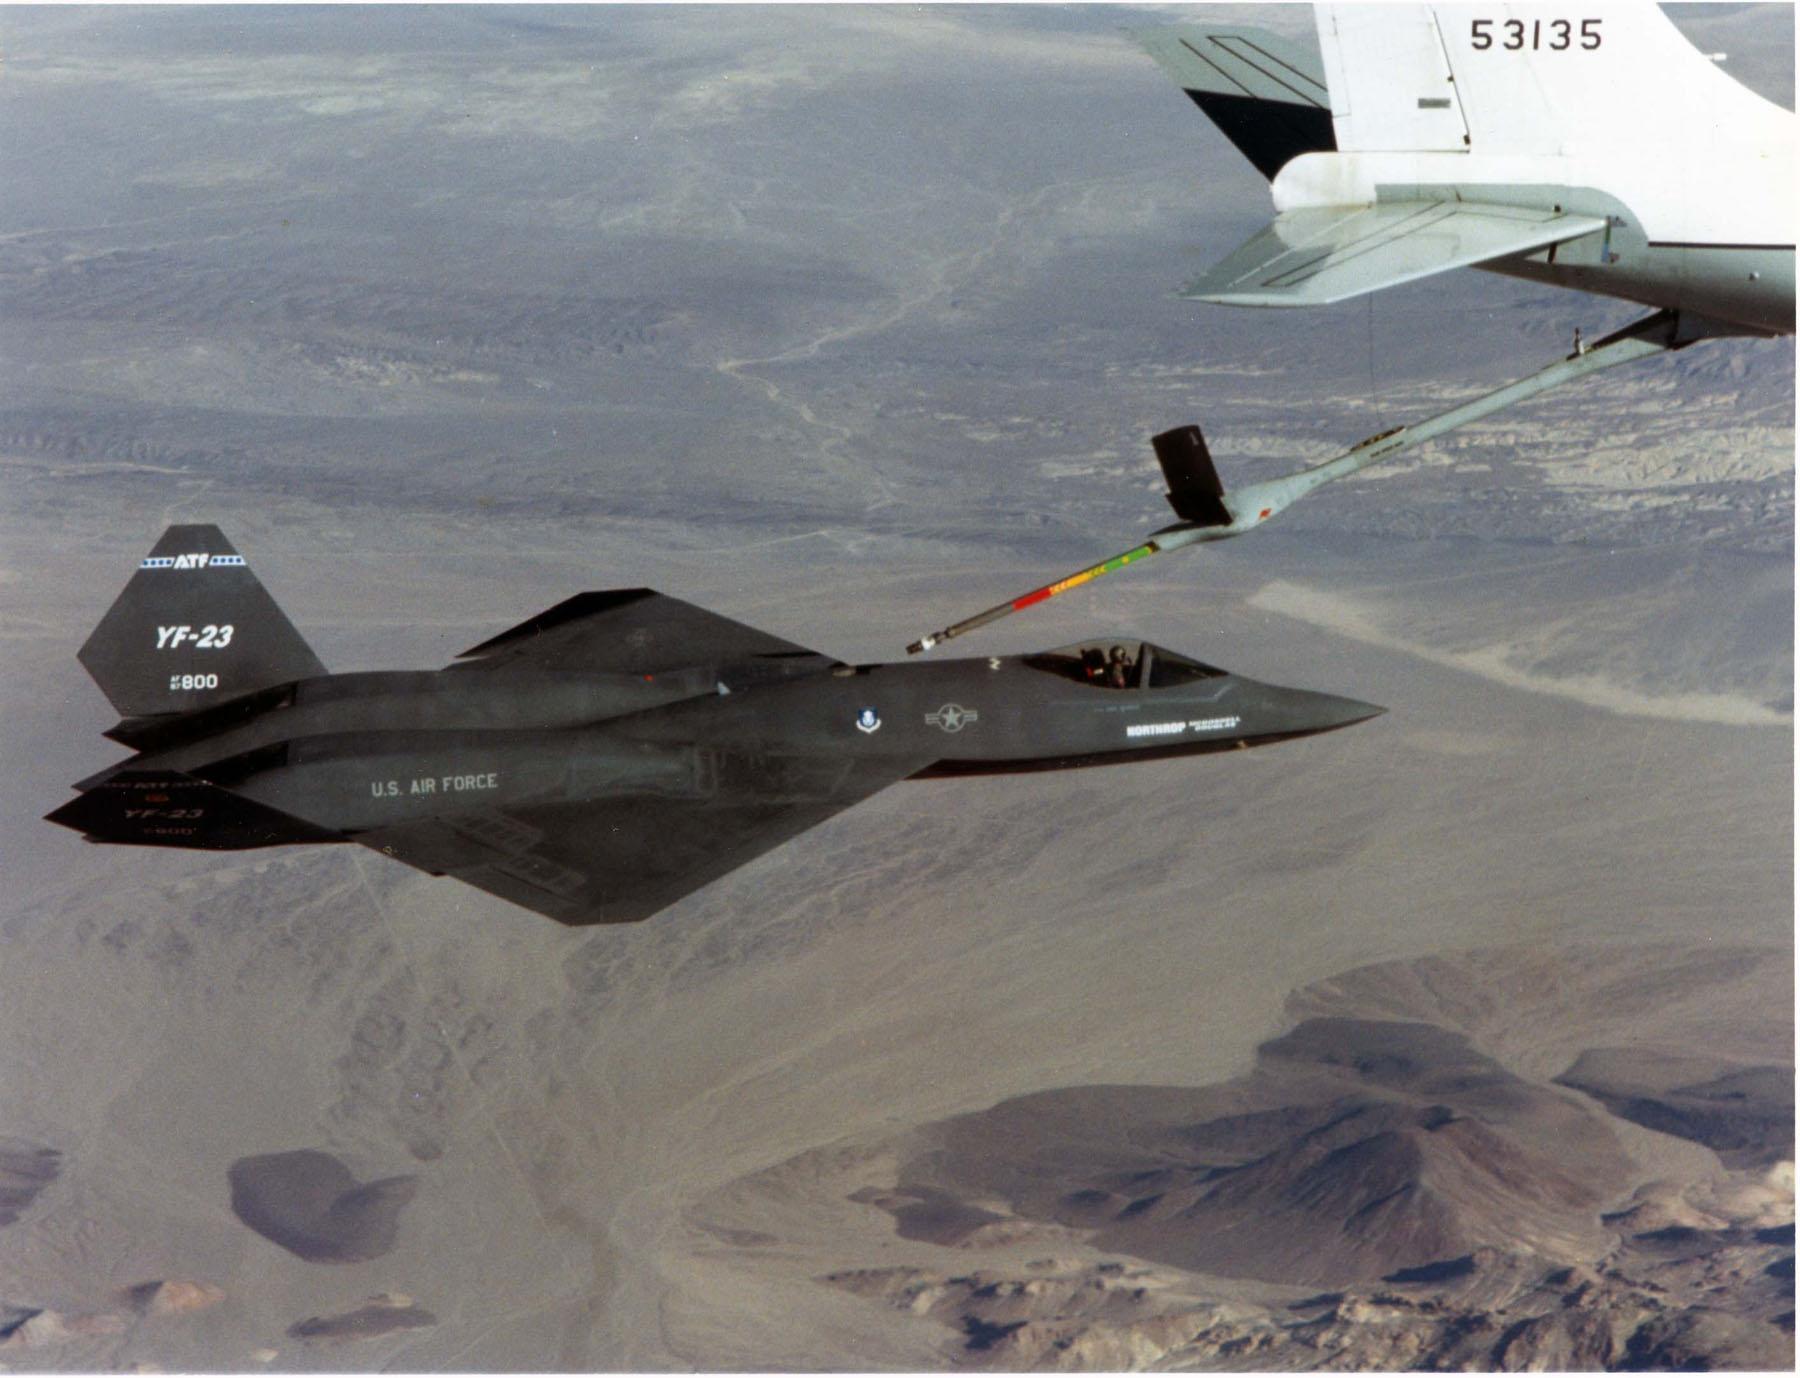 File:YF-23 refueling.jpg